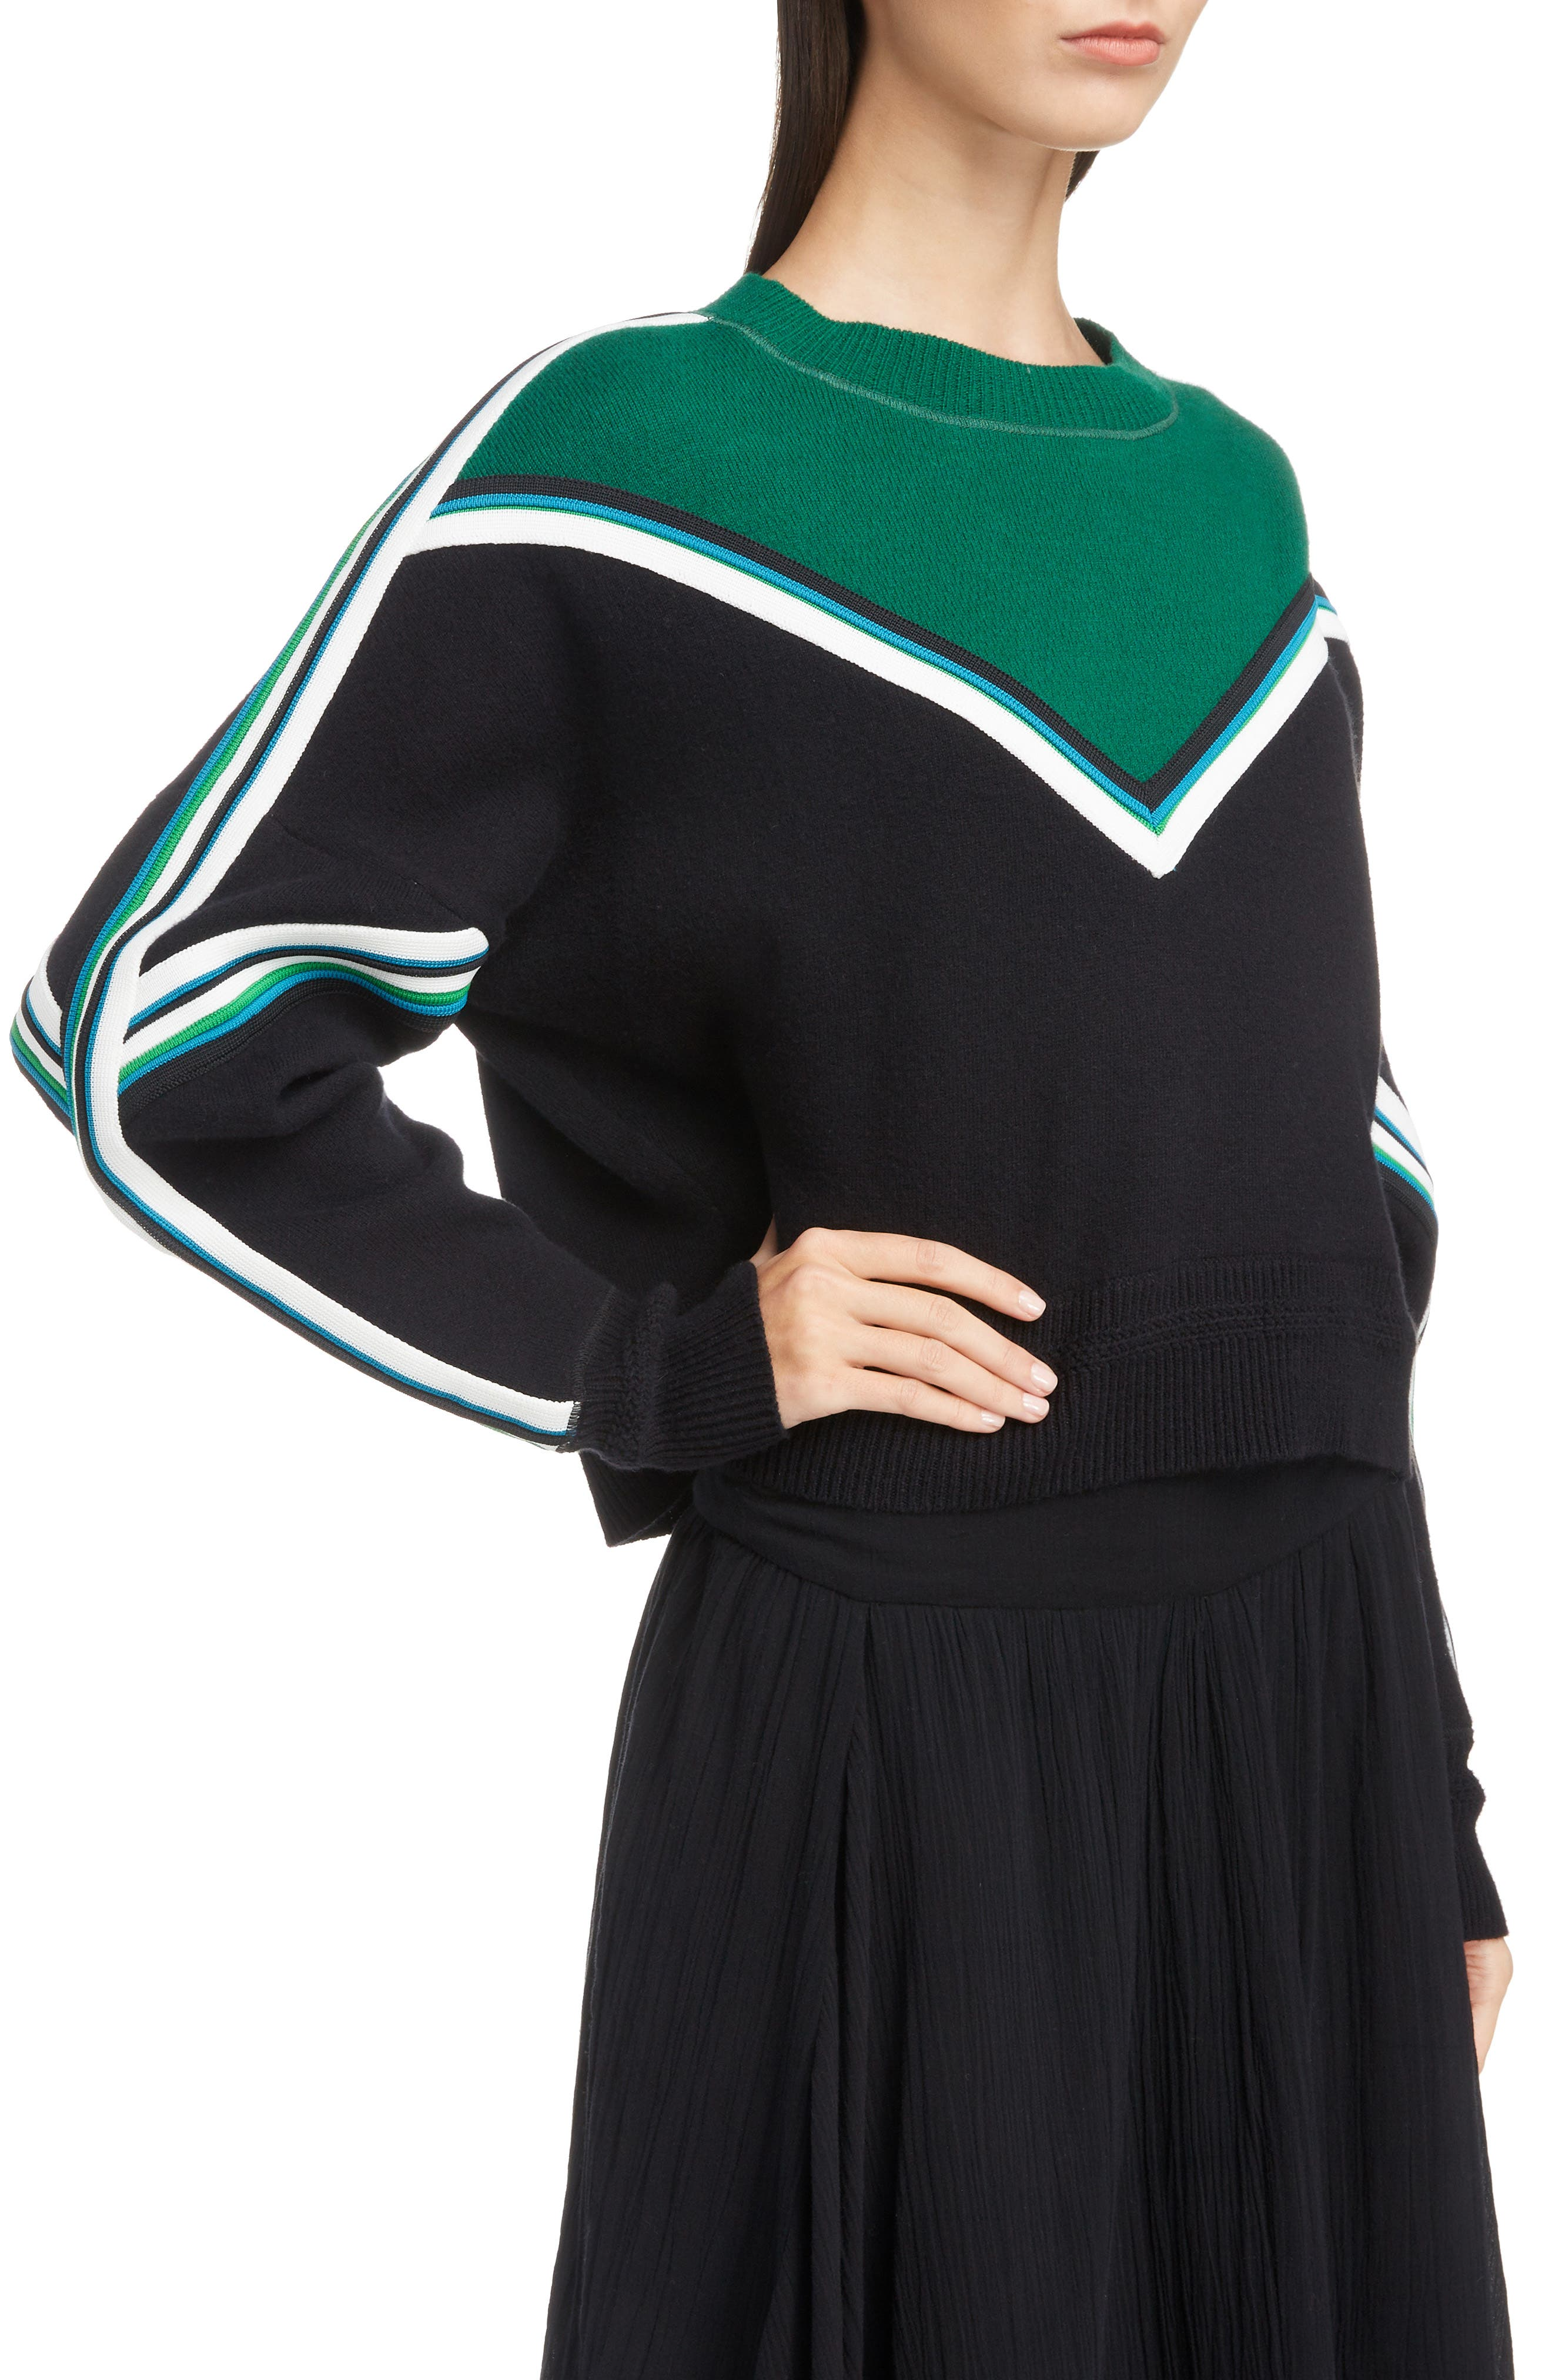 Kimo Stripe Detail Sweater,                             Alternate thumbnail 4, color,                             005